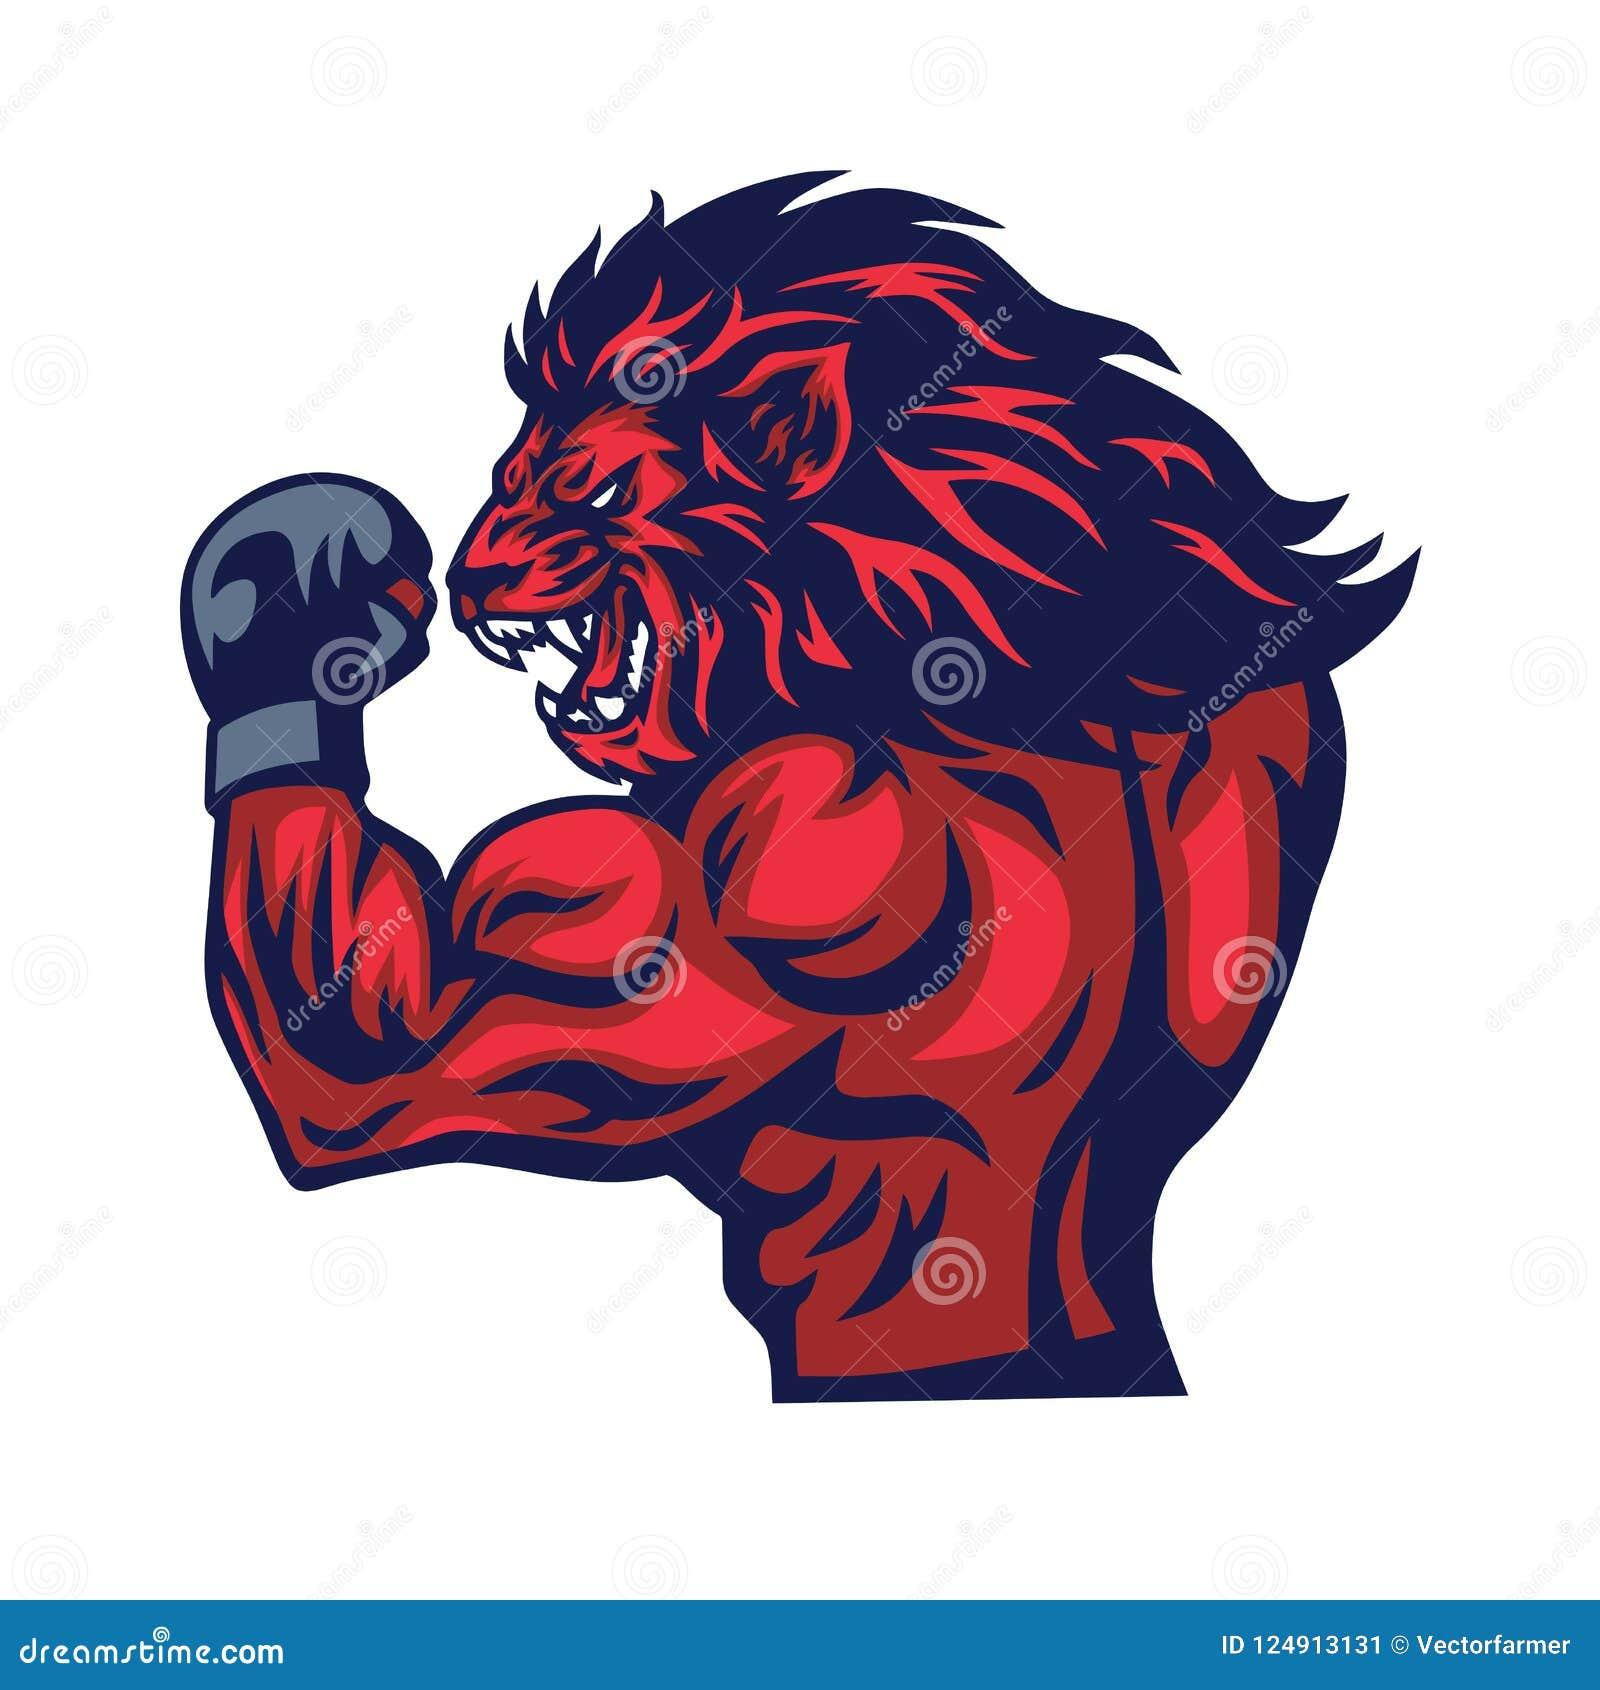 Lion Fighter Mascot Vector